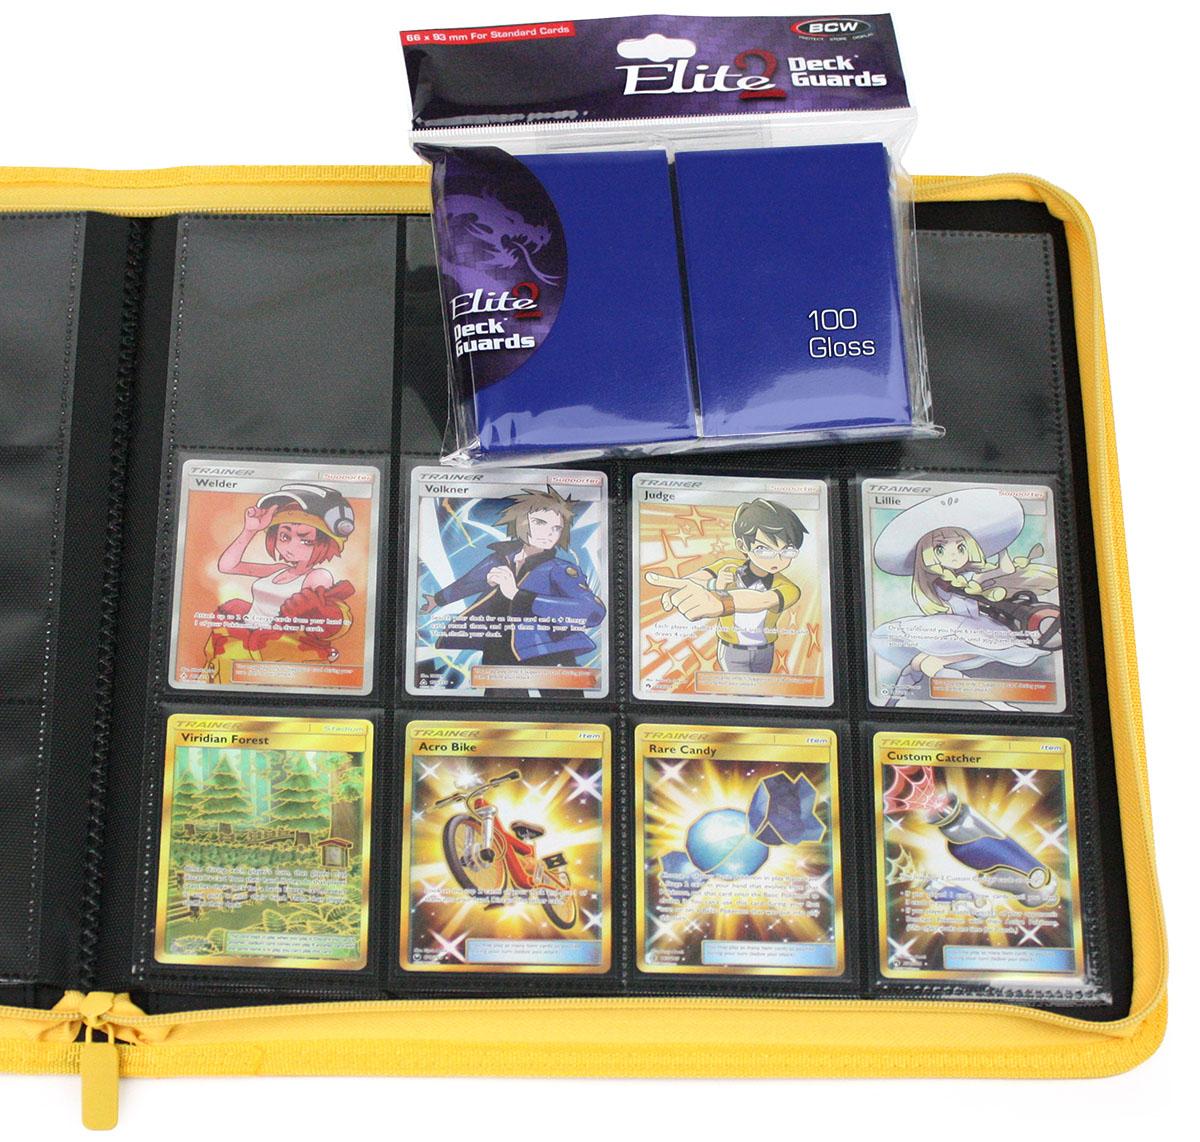 300 Matte Black MTG BCW Deck Guards CCG Pokemon Gaming Card Sleeves 6 New Packs